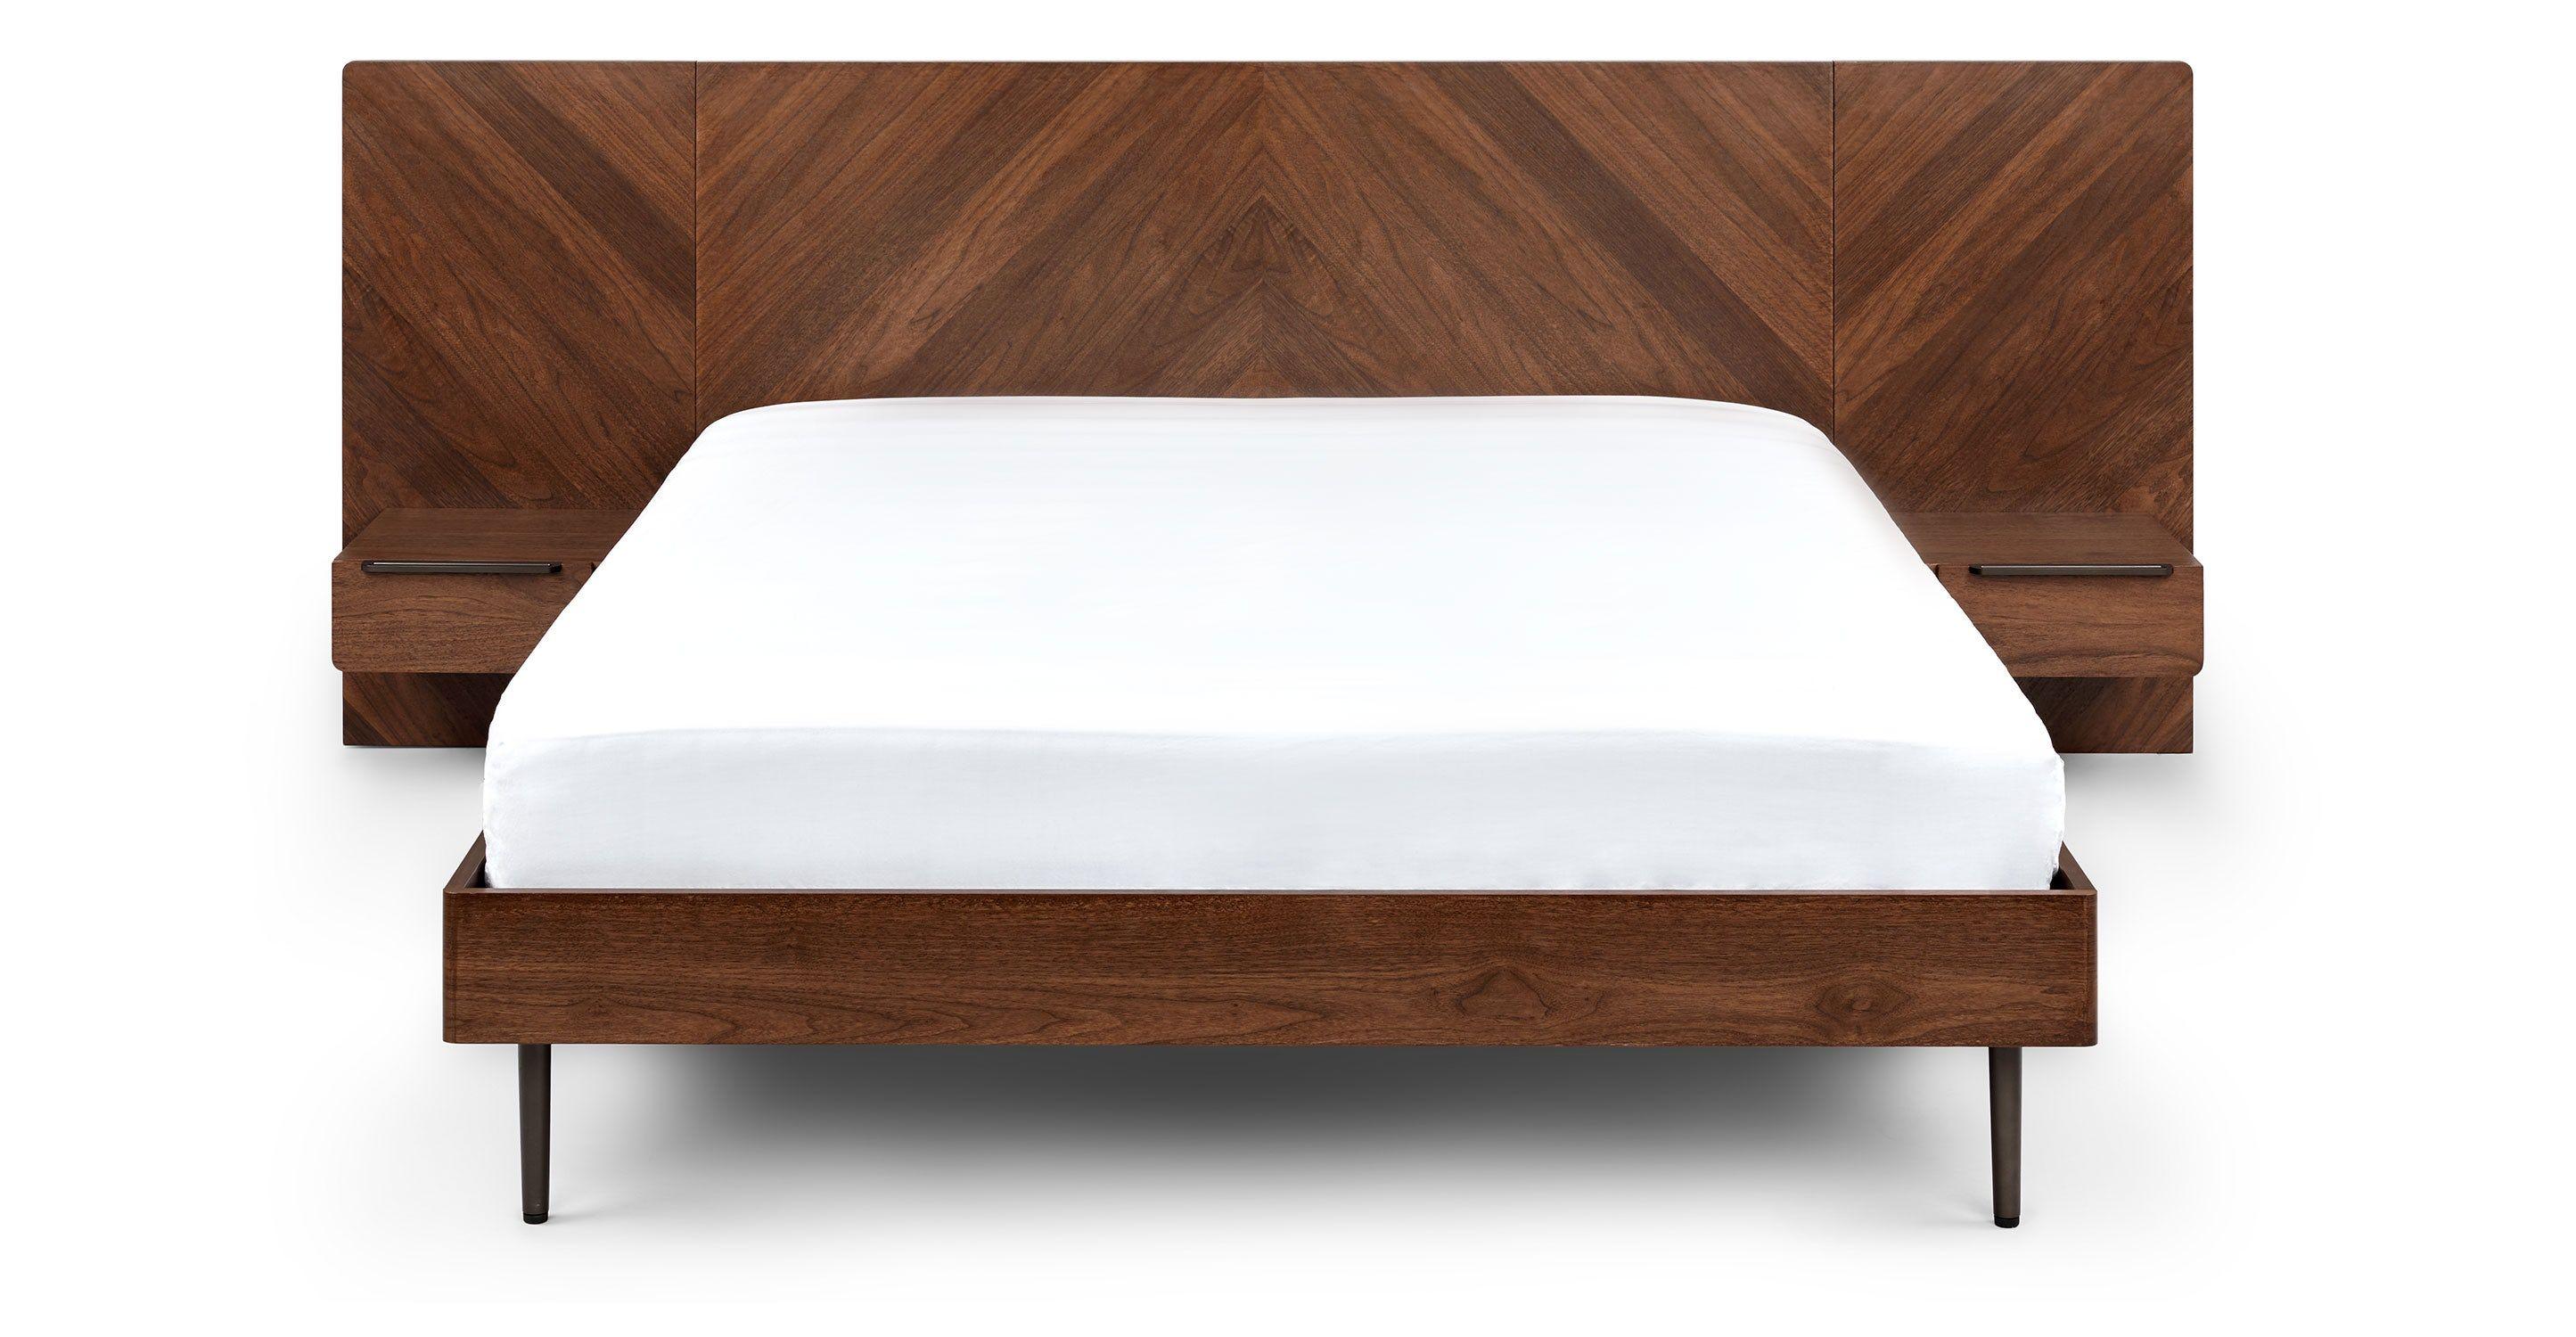 Nera Walnut Queen Bed In 2020 Modern King Bed Frame Mid Century